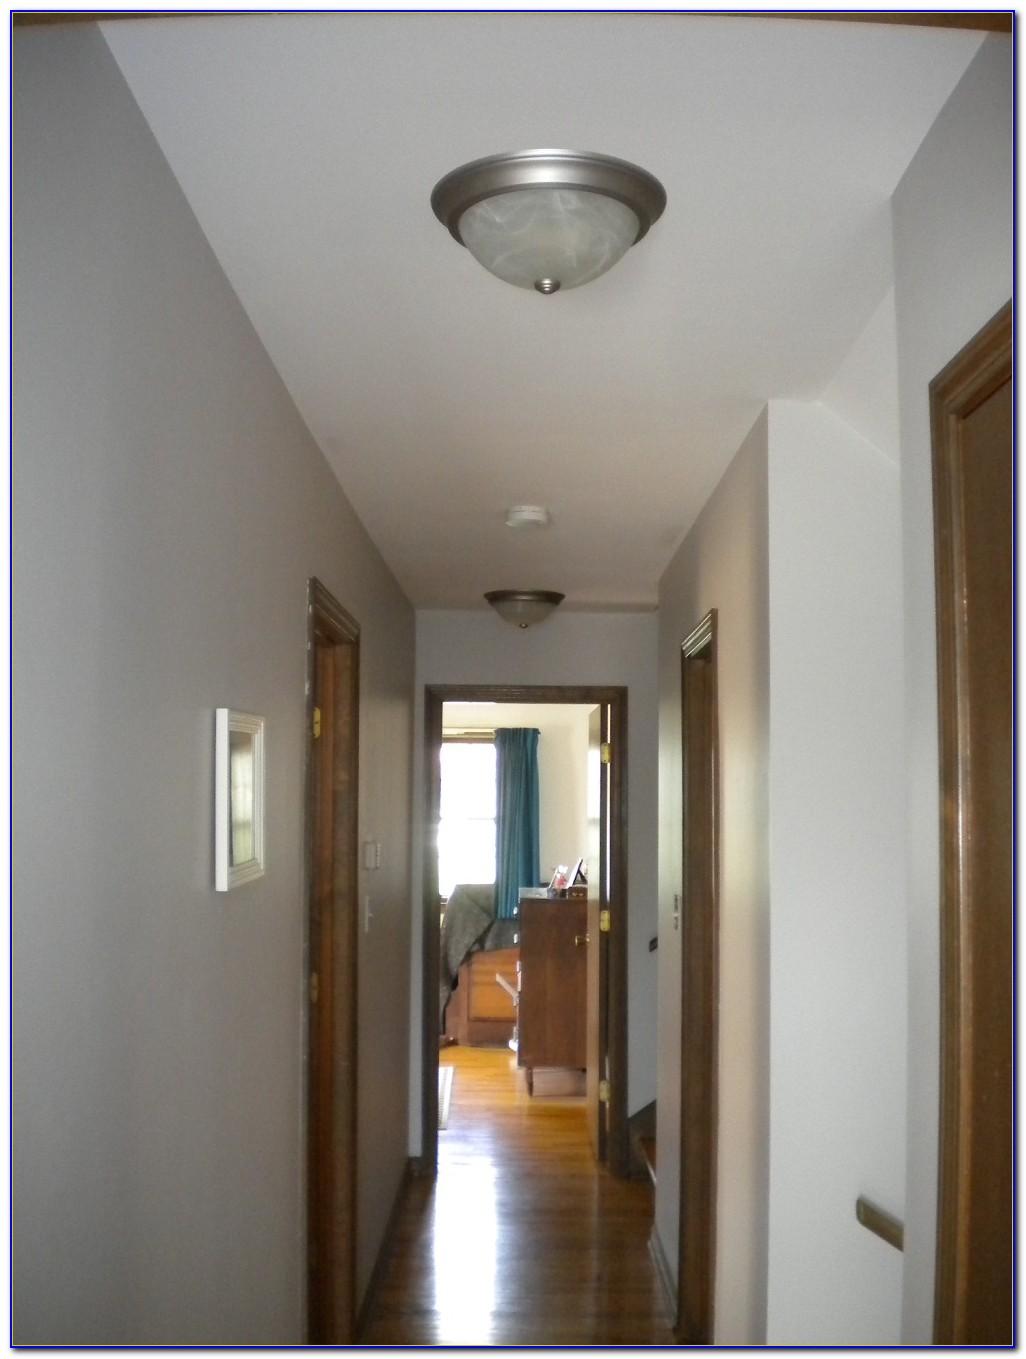 Light Fixture For Hallway Ceiling